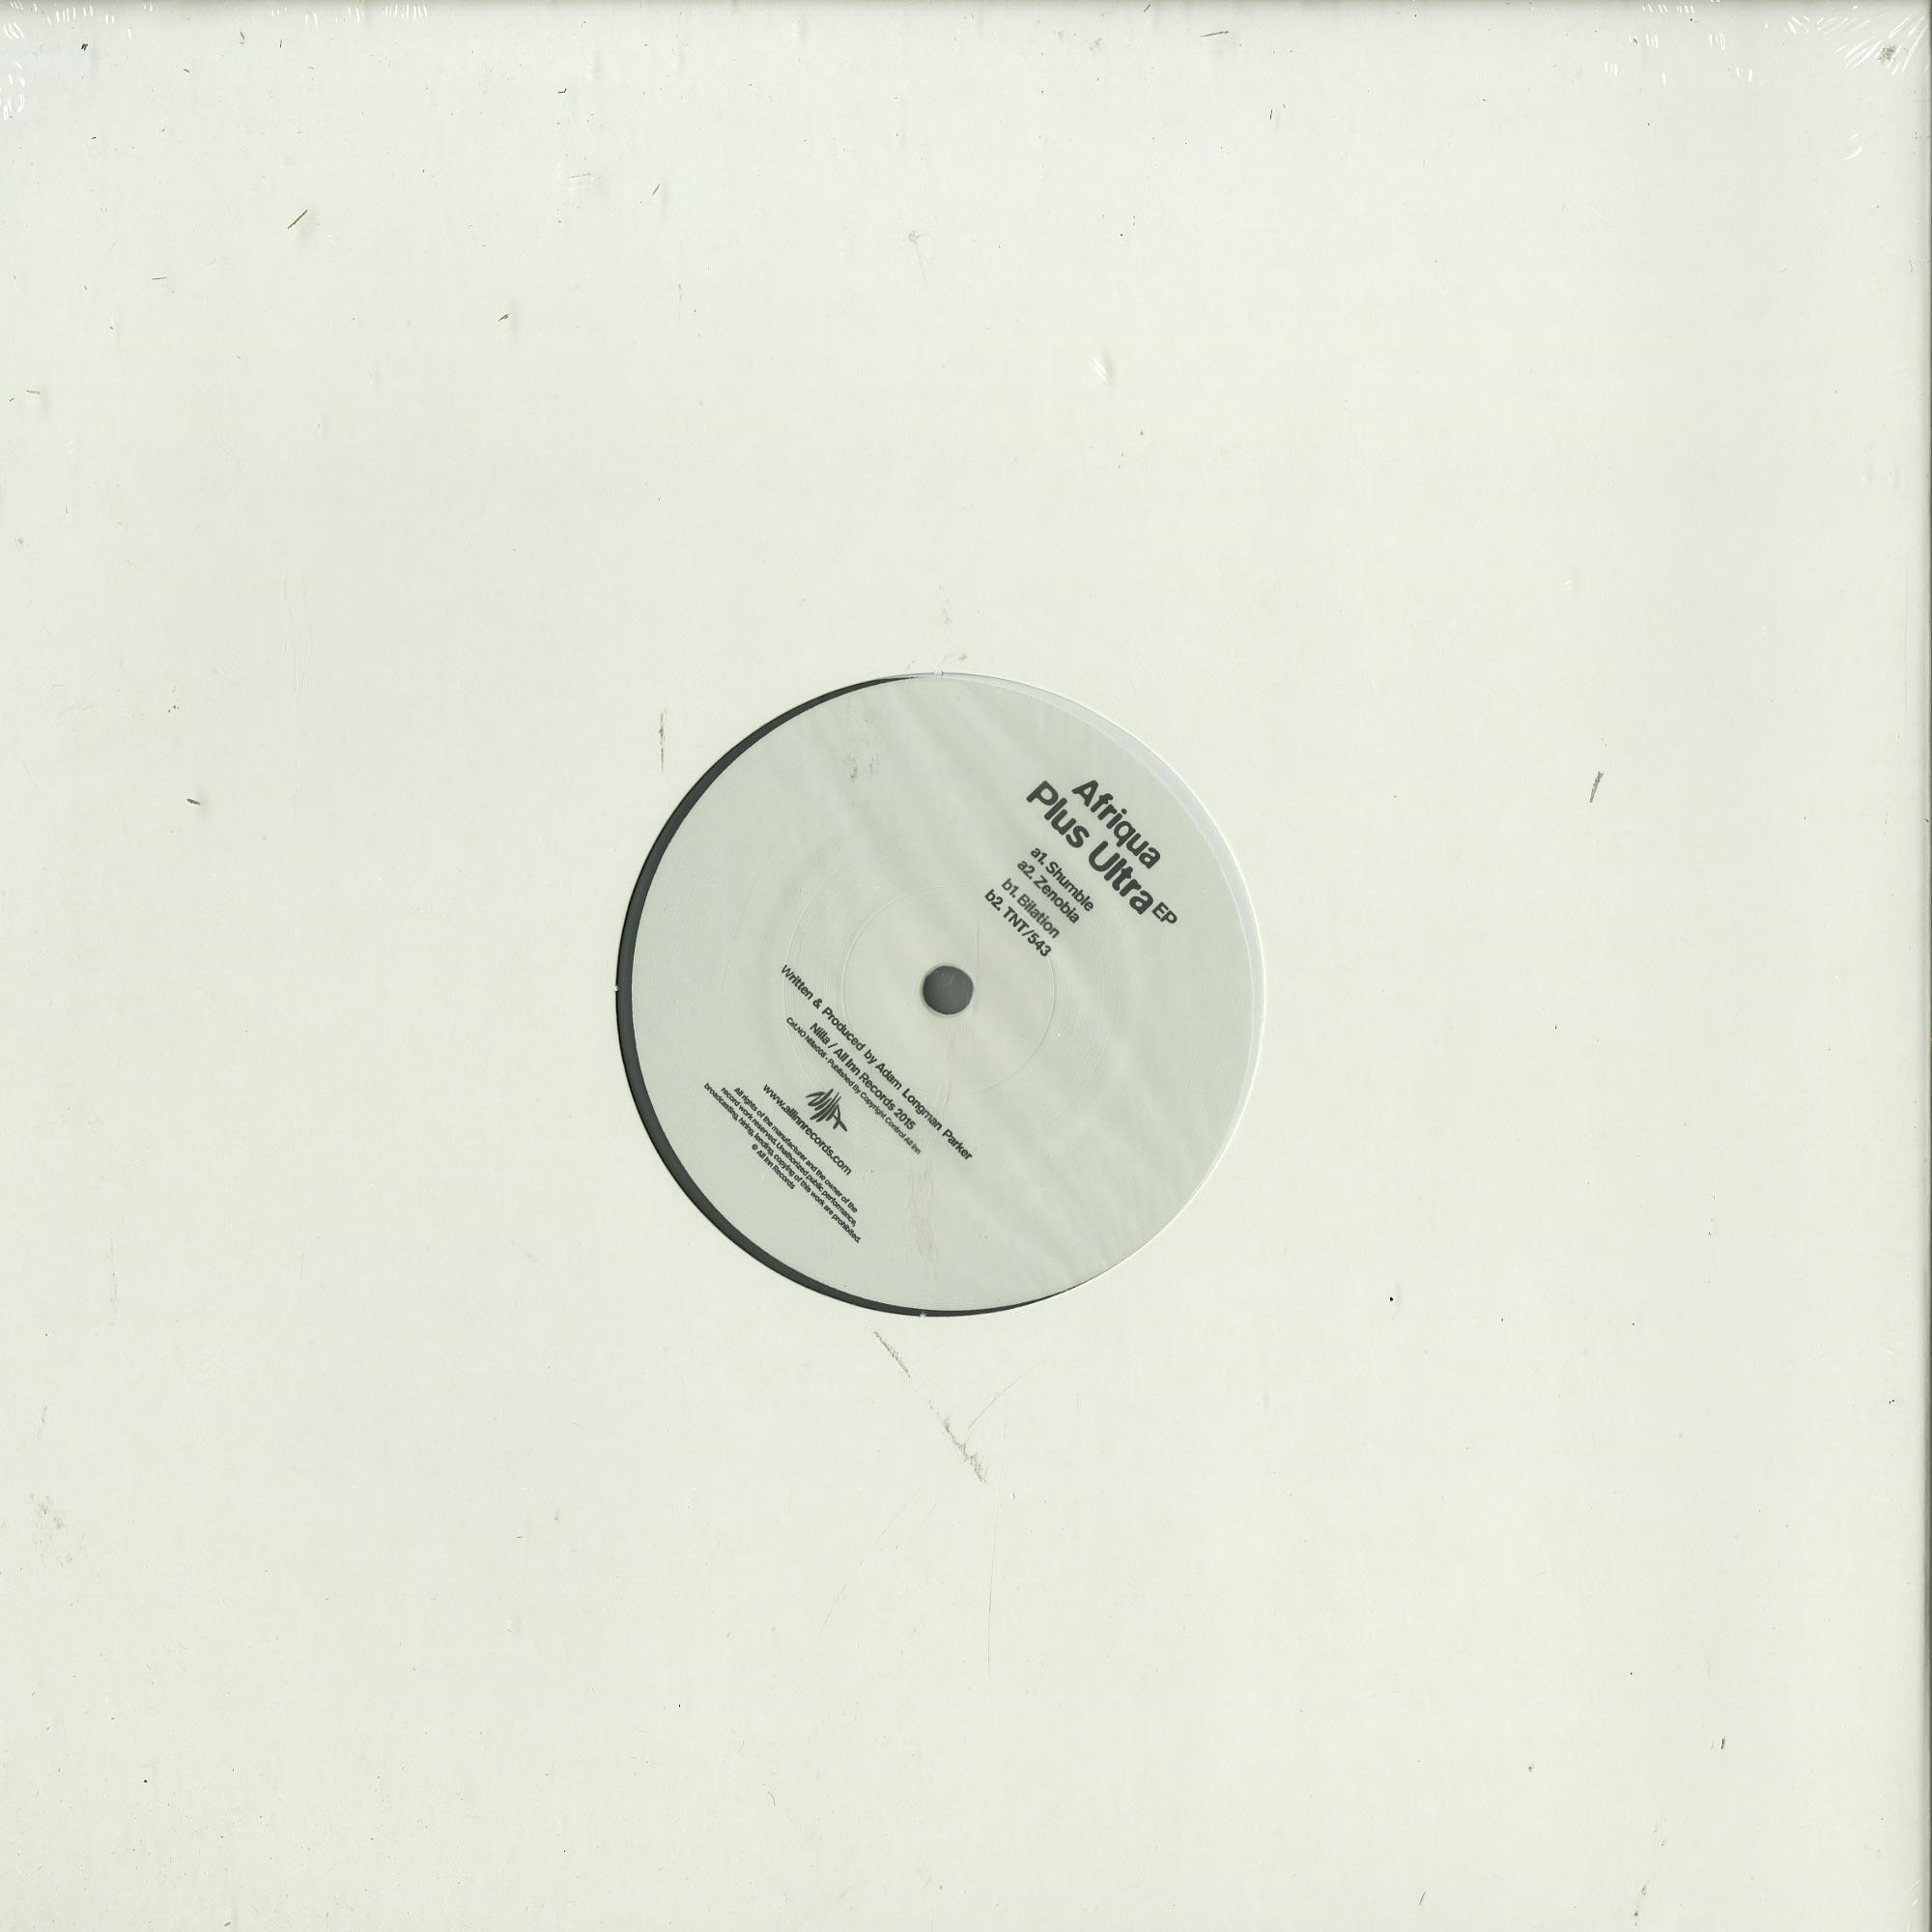 Afriqua - PLUS ULTRA EP